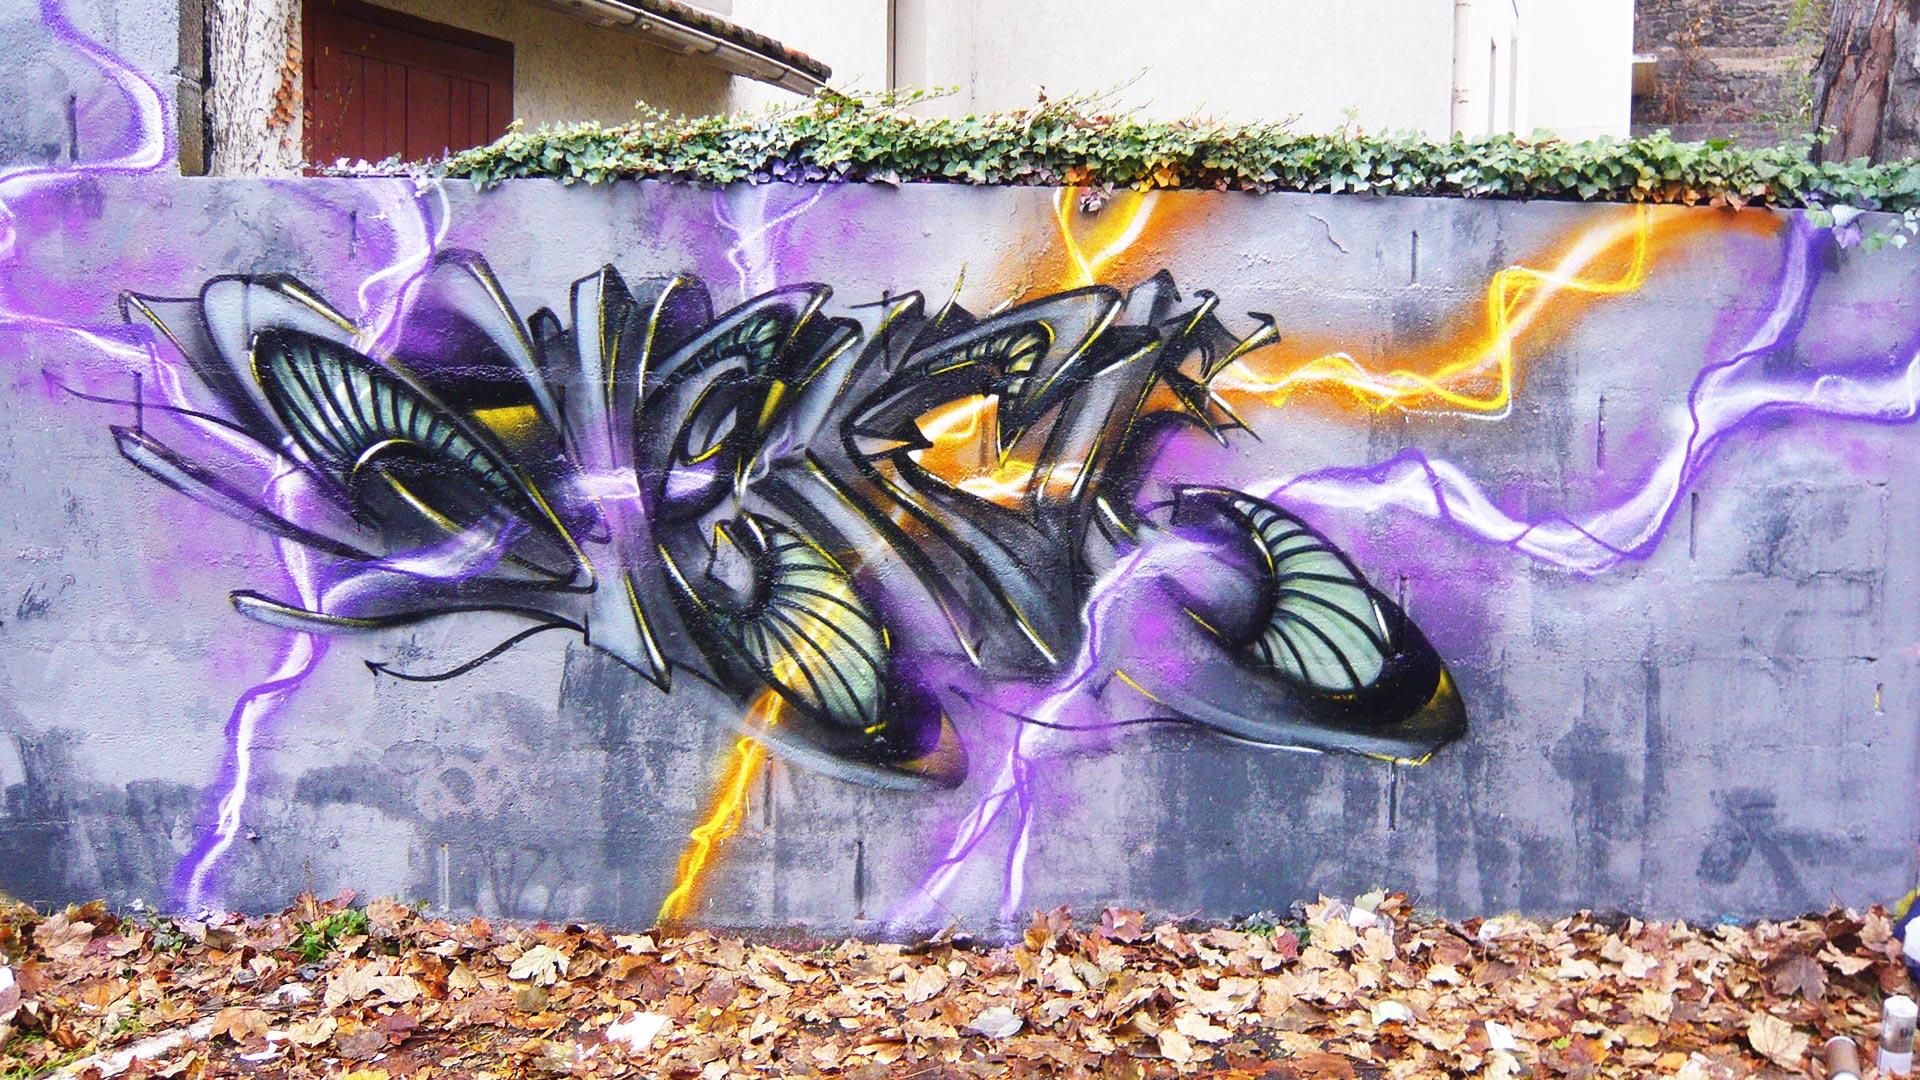 Deft - tracé direct - Graffiti